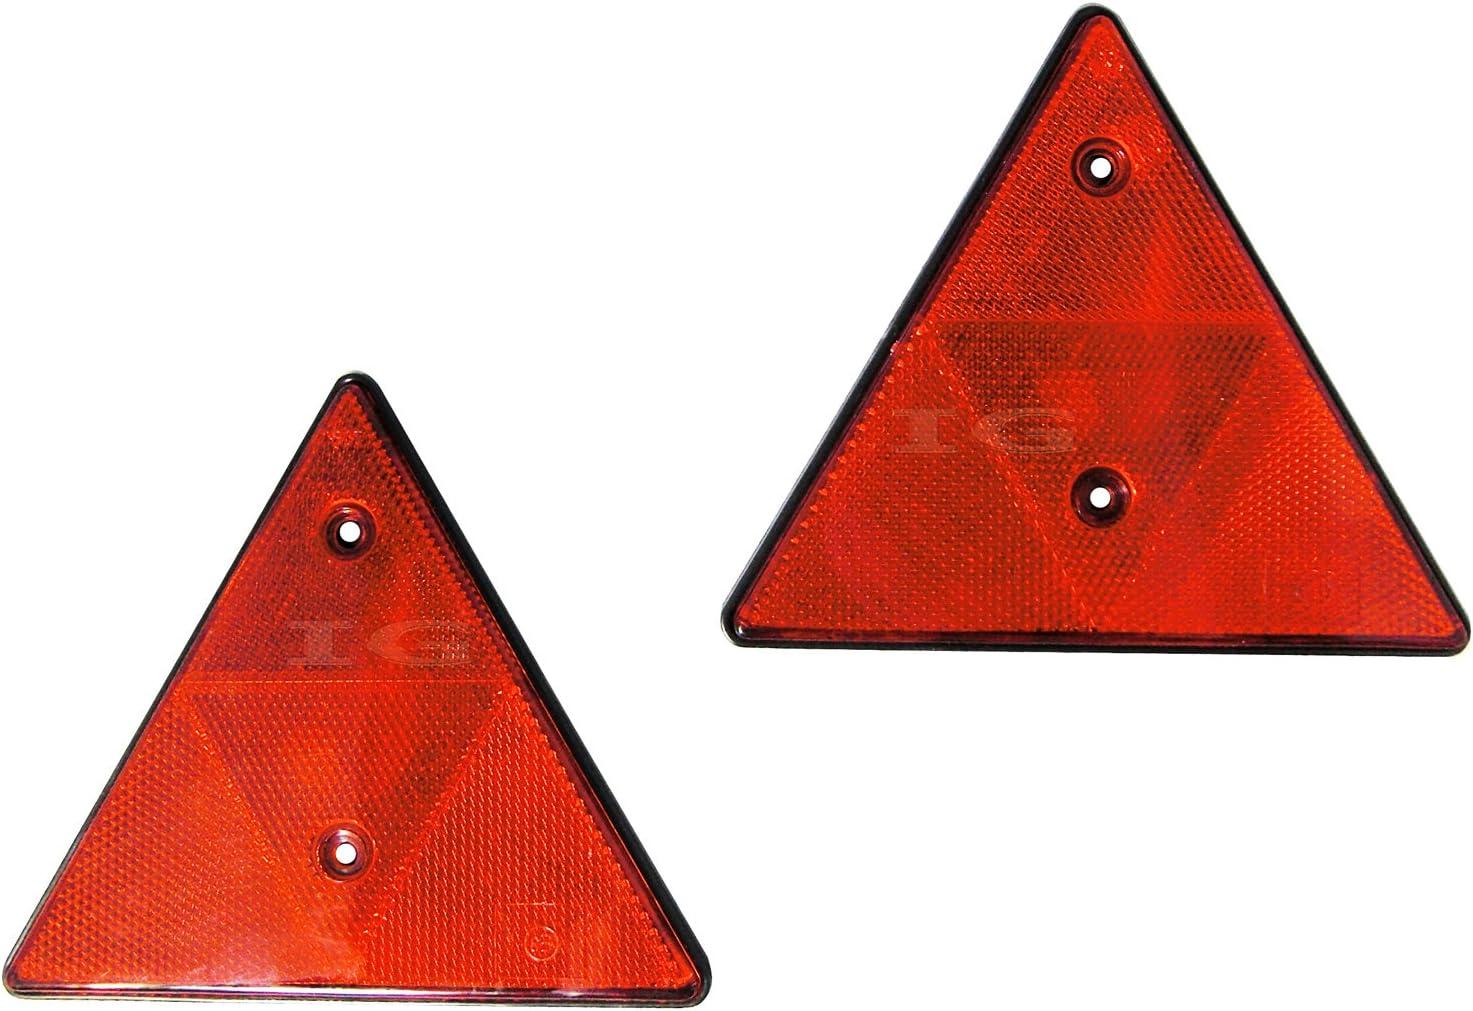 2 Stück Dreieckrückstrahler Anhänger 150 Mm Rückstrahler Reflektor Dreieck Auto